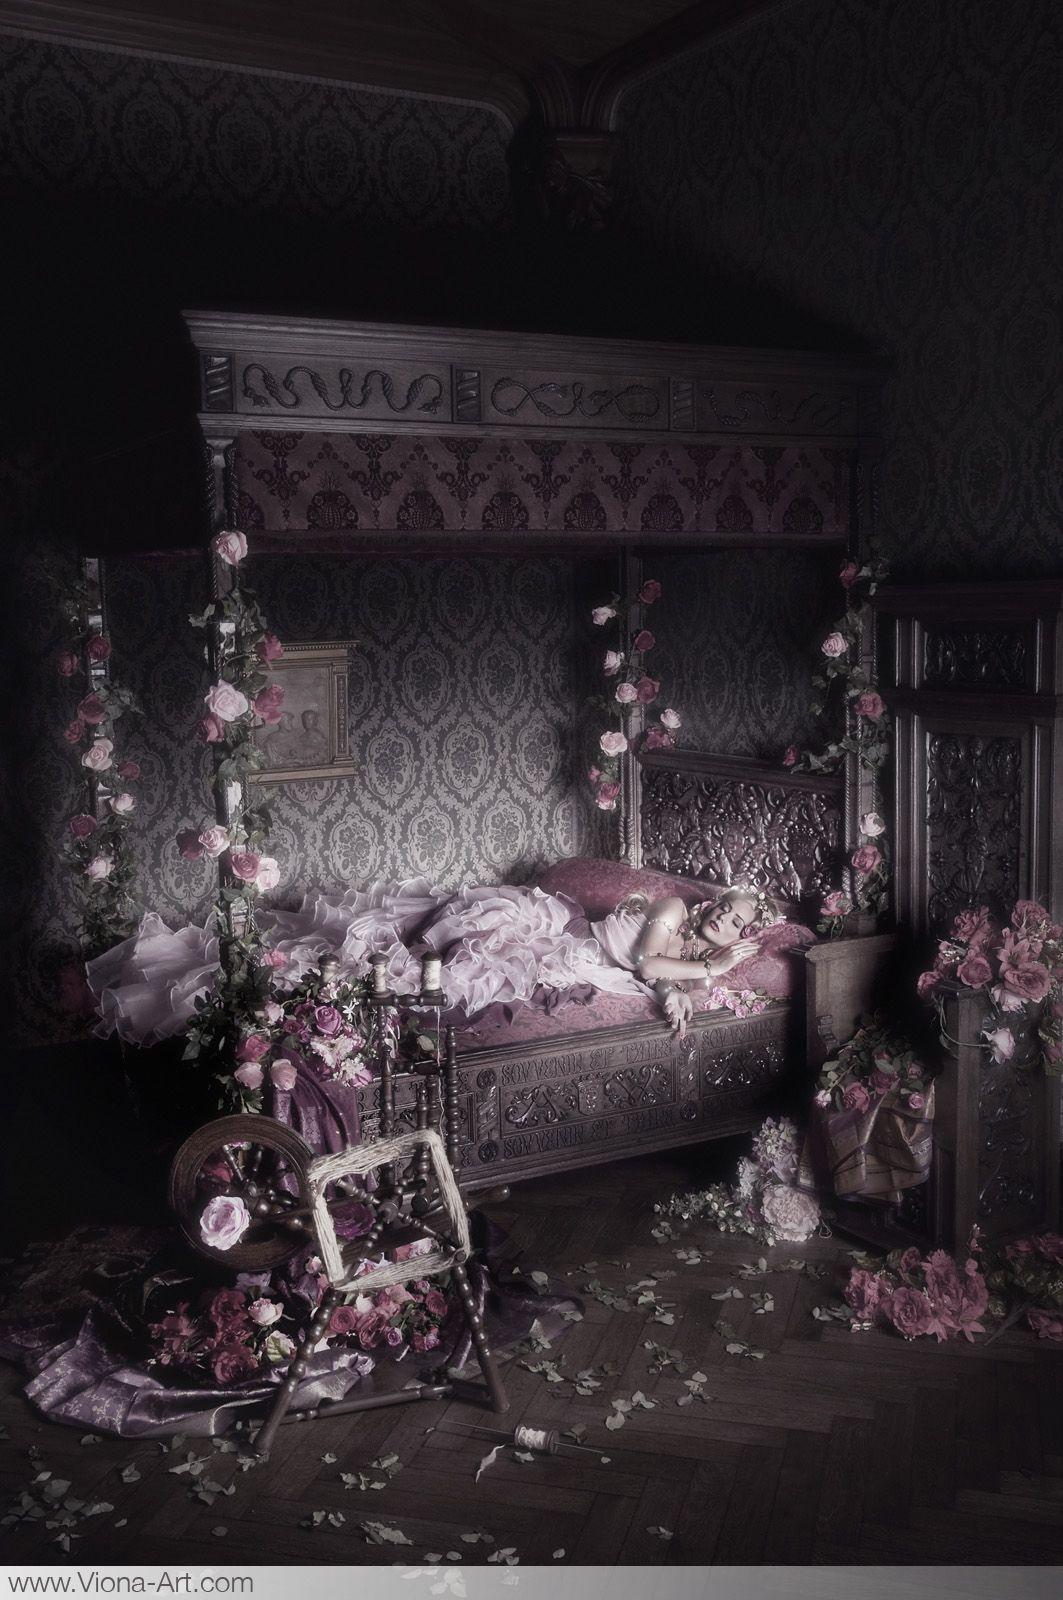 Viona ielegems  Gothic fairytale photography